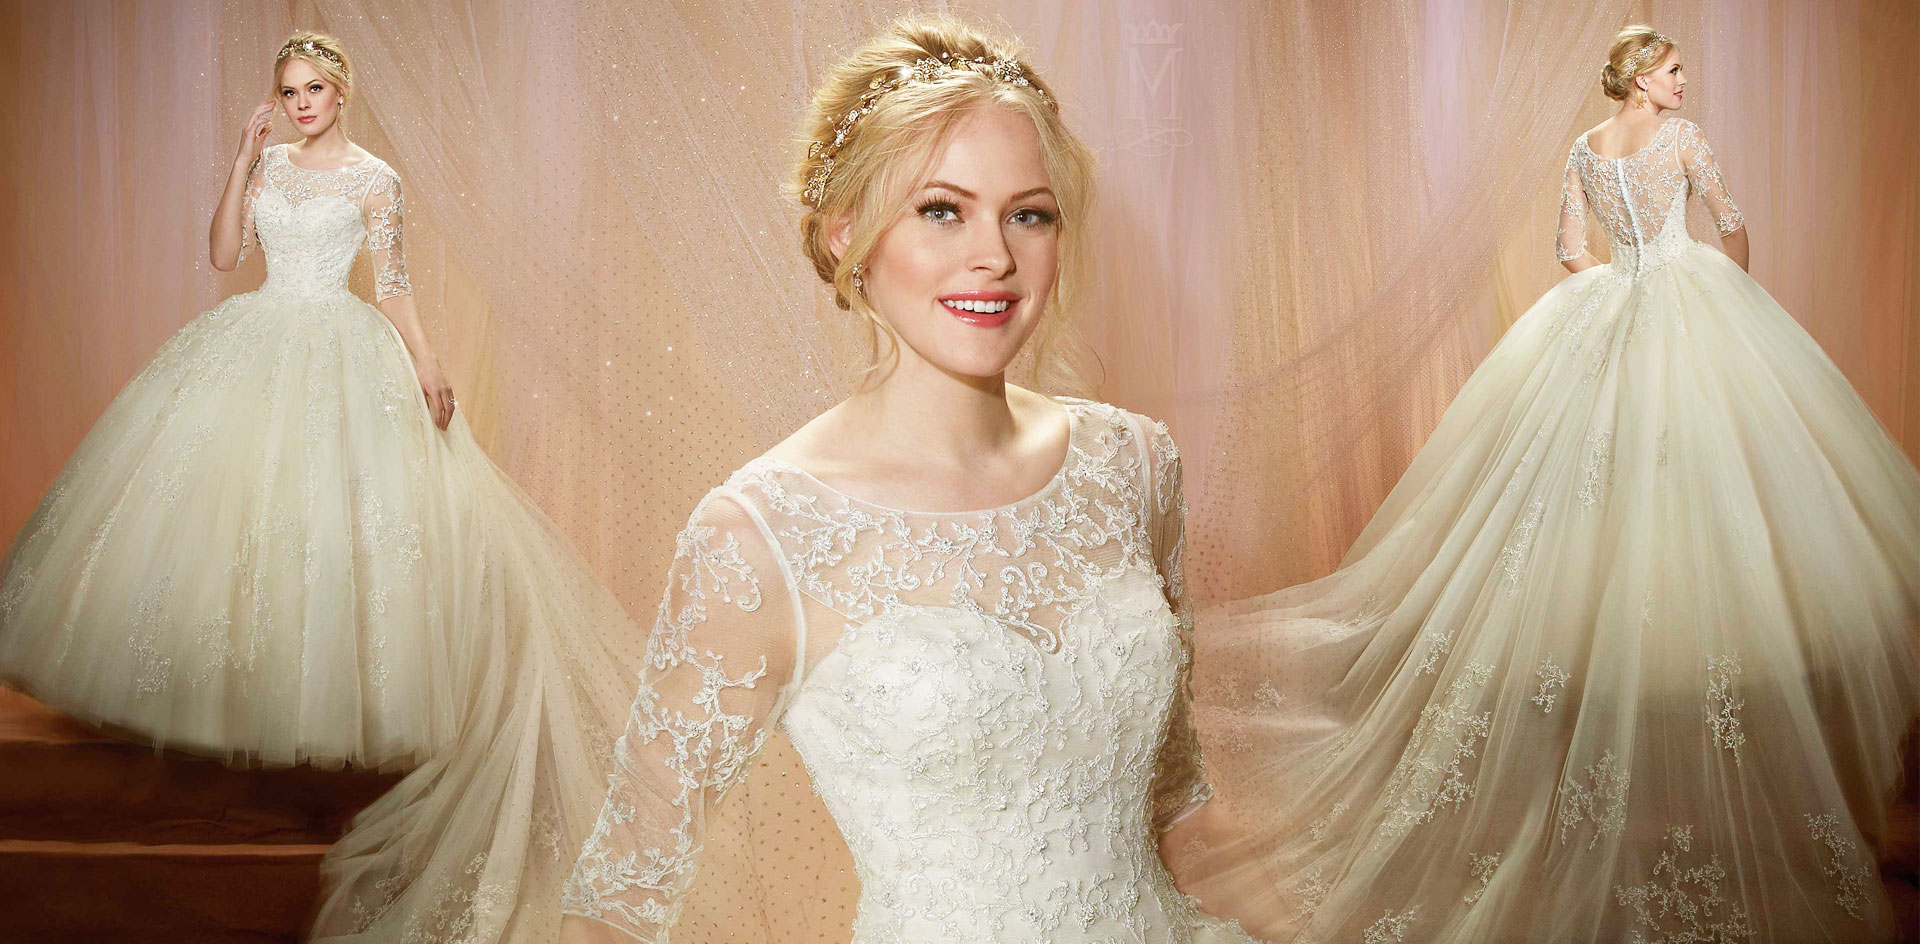 Wedding Dresses Bridal Gowns Formal